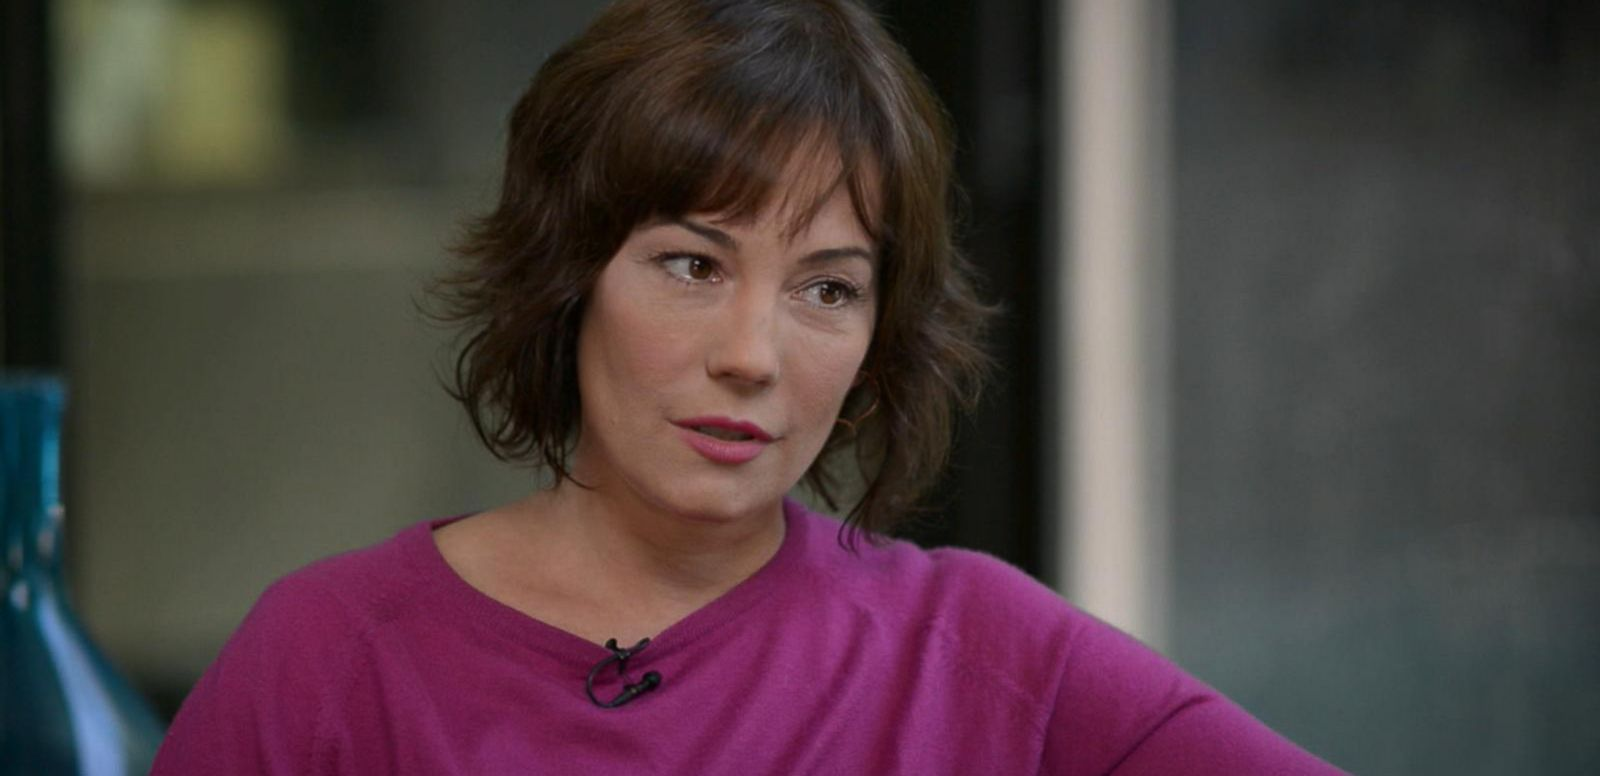 VIDEO: Natasha Gregson Wagner Remembers Her Mom, Actress Natalie Wood